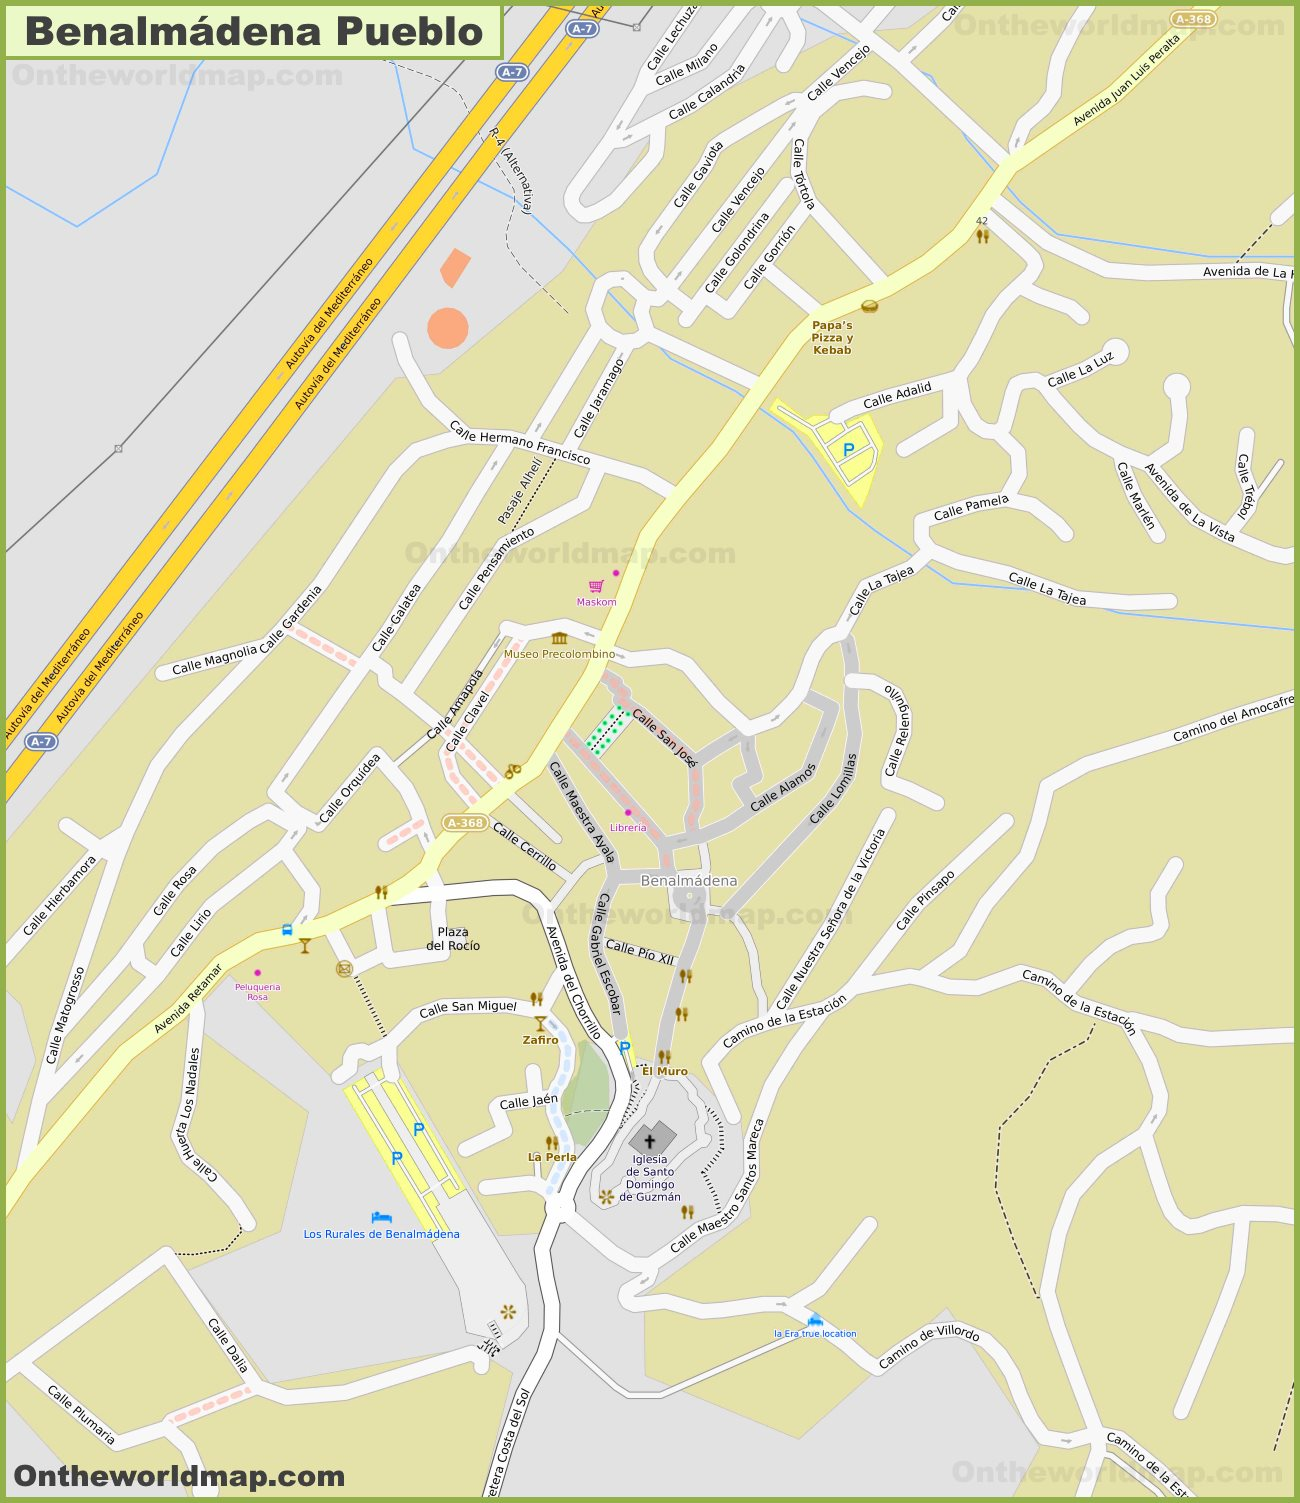 Benalmadena Pueblo Map